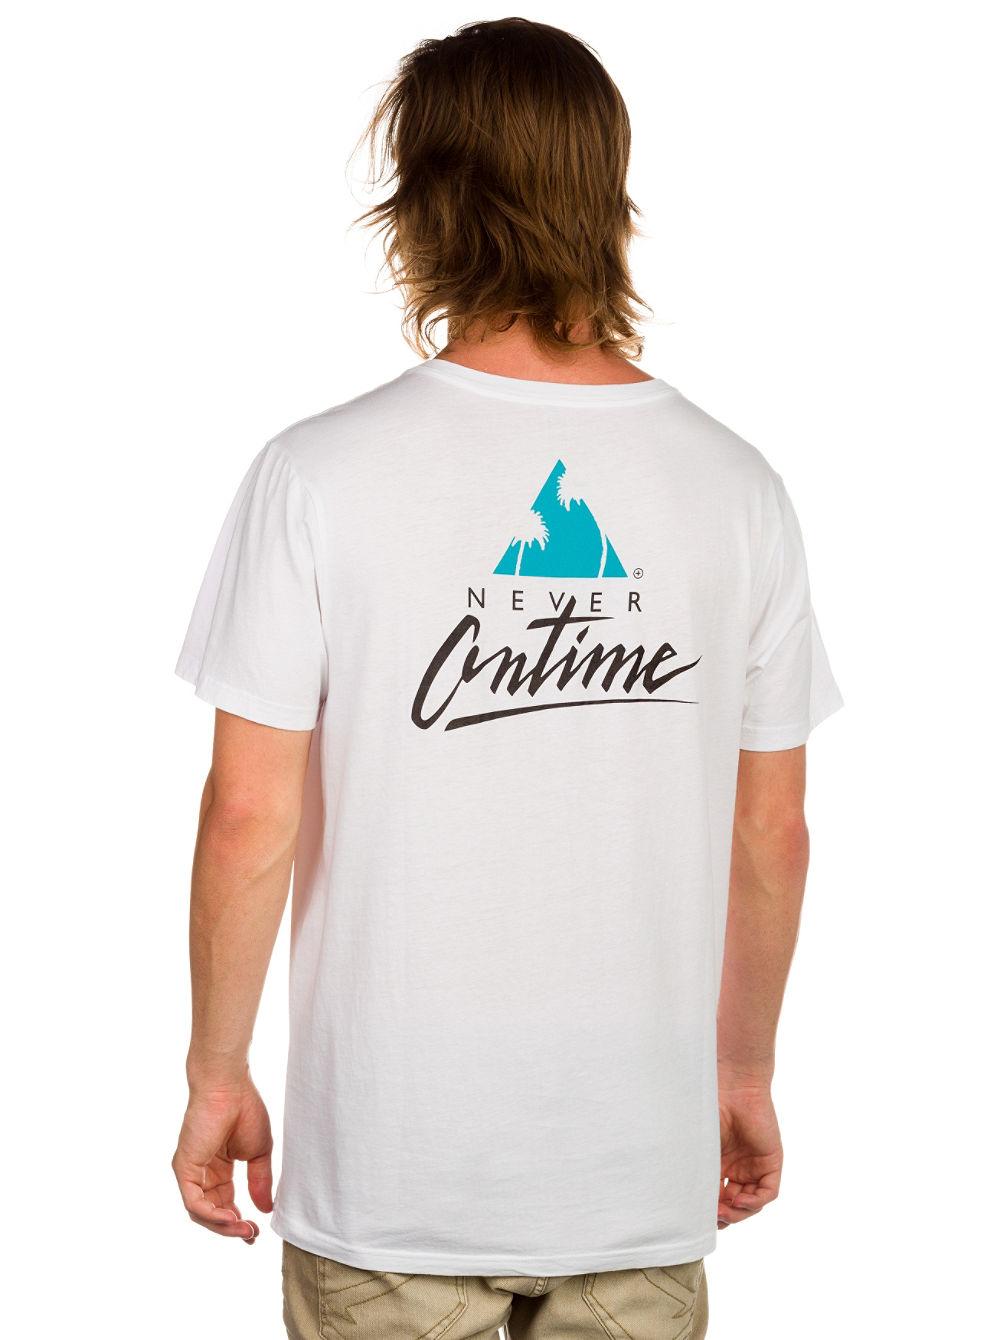 never-ontime-t-shirt